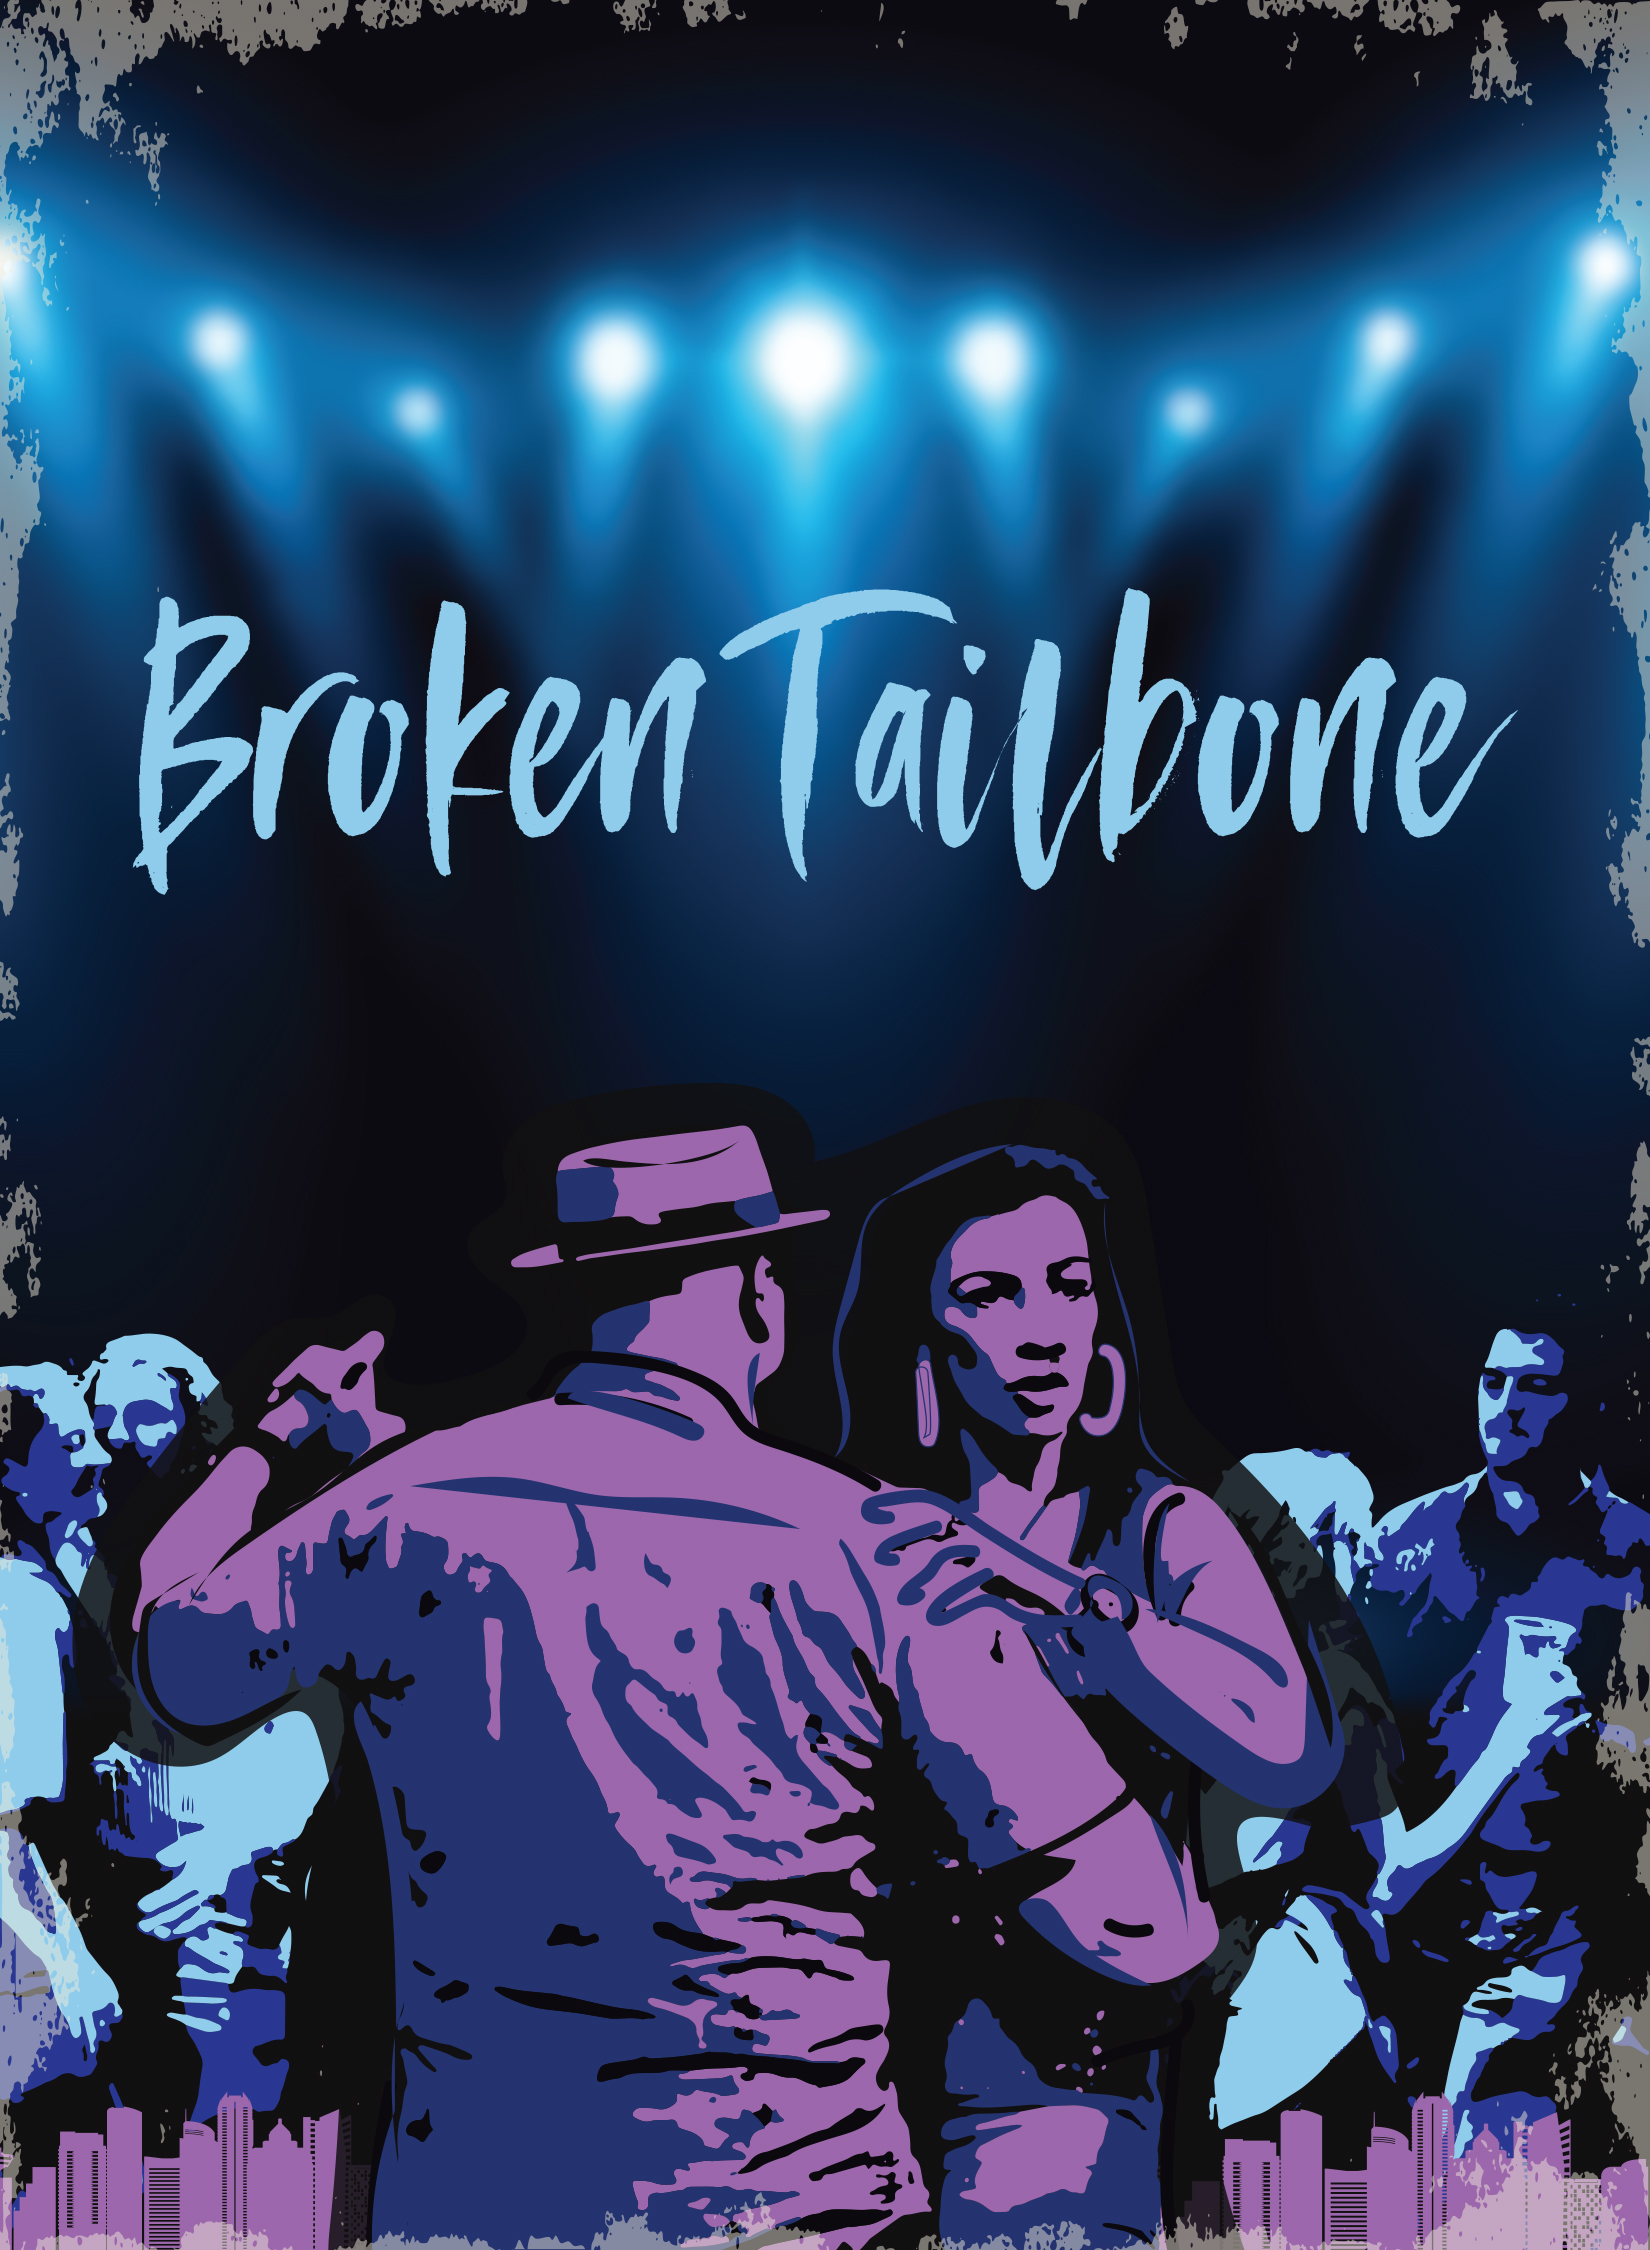 Broken Tailbone Show Image